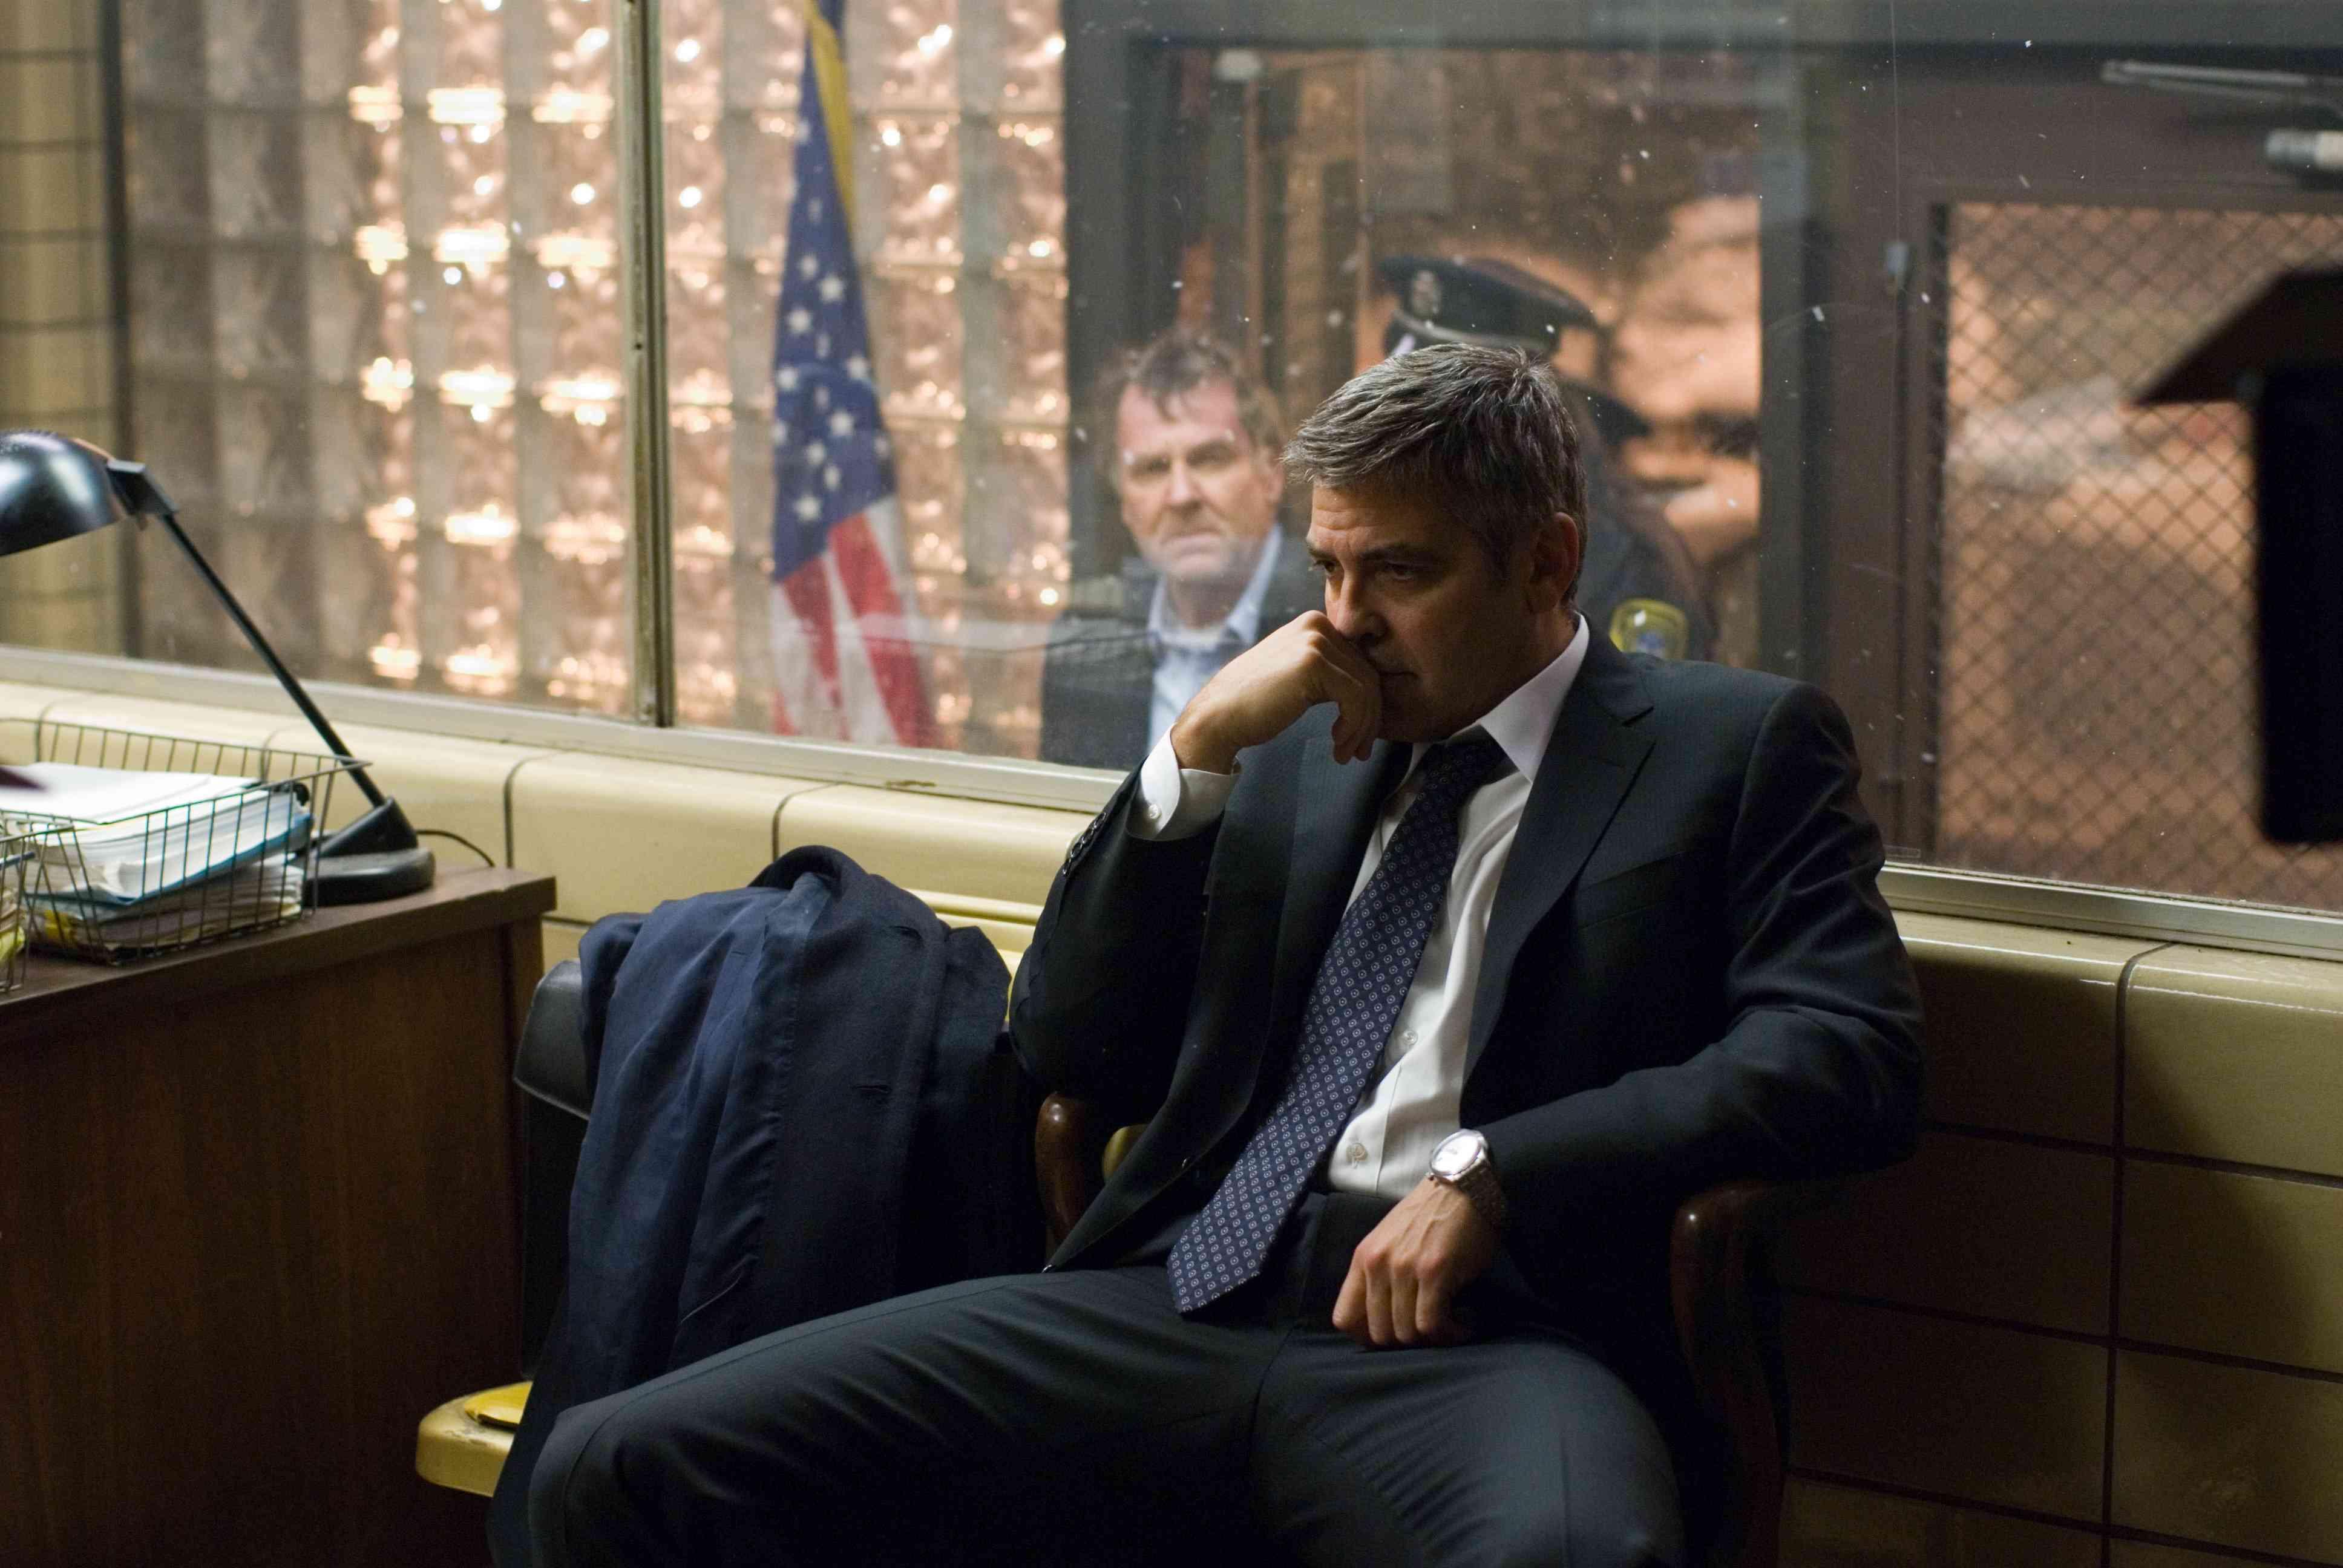 Michael Clayton (George Clooney) - Michael Clayton